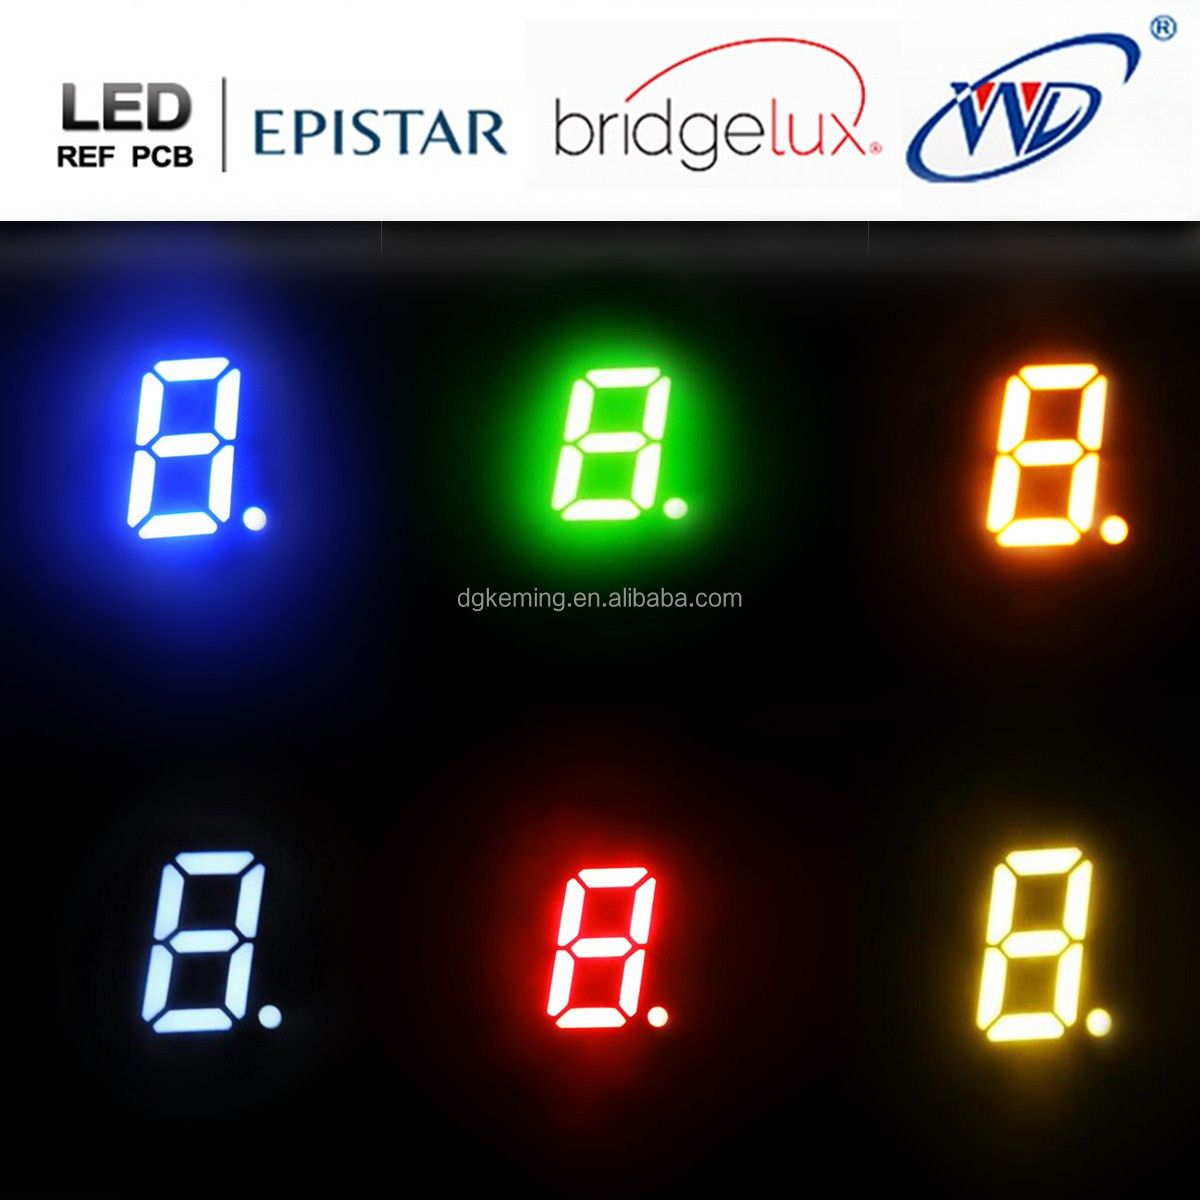 0.3 inch 7 segment led display red mini 7 segment led display